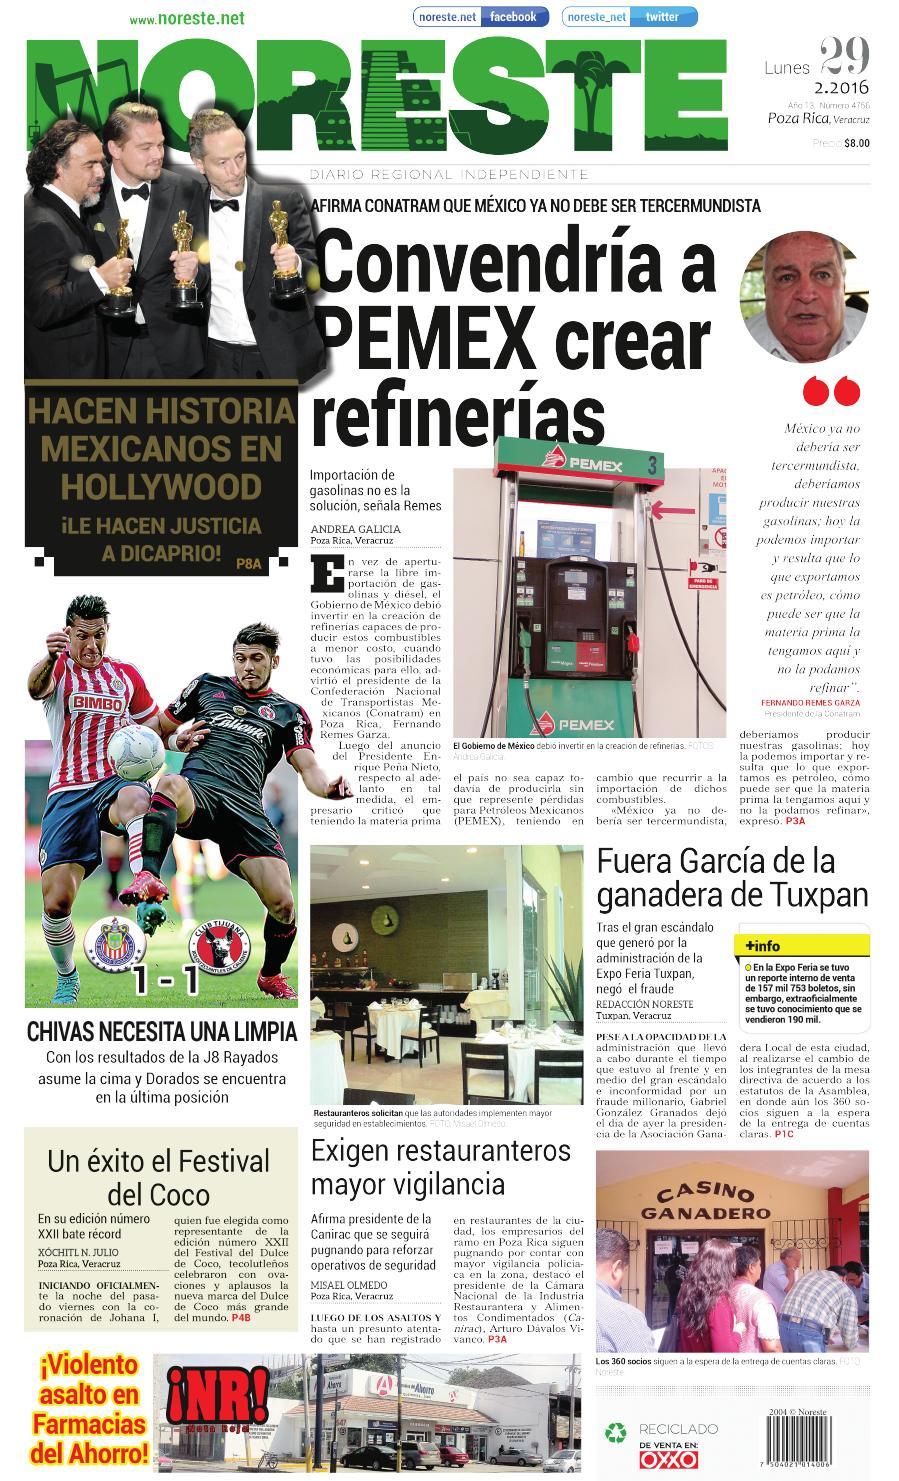 Versi N Impresa 29 Febrero 2016 By Noreste Diario Regional  # Cota Muebles Teziutlan Puebla